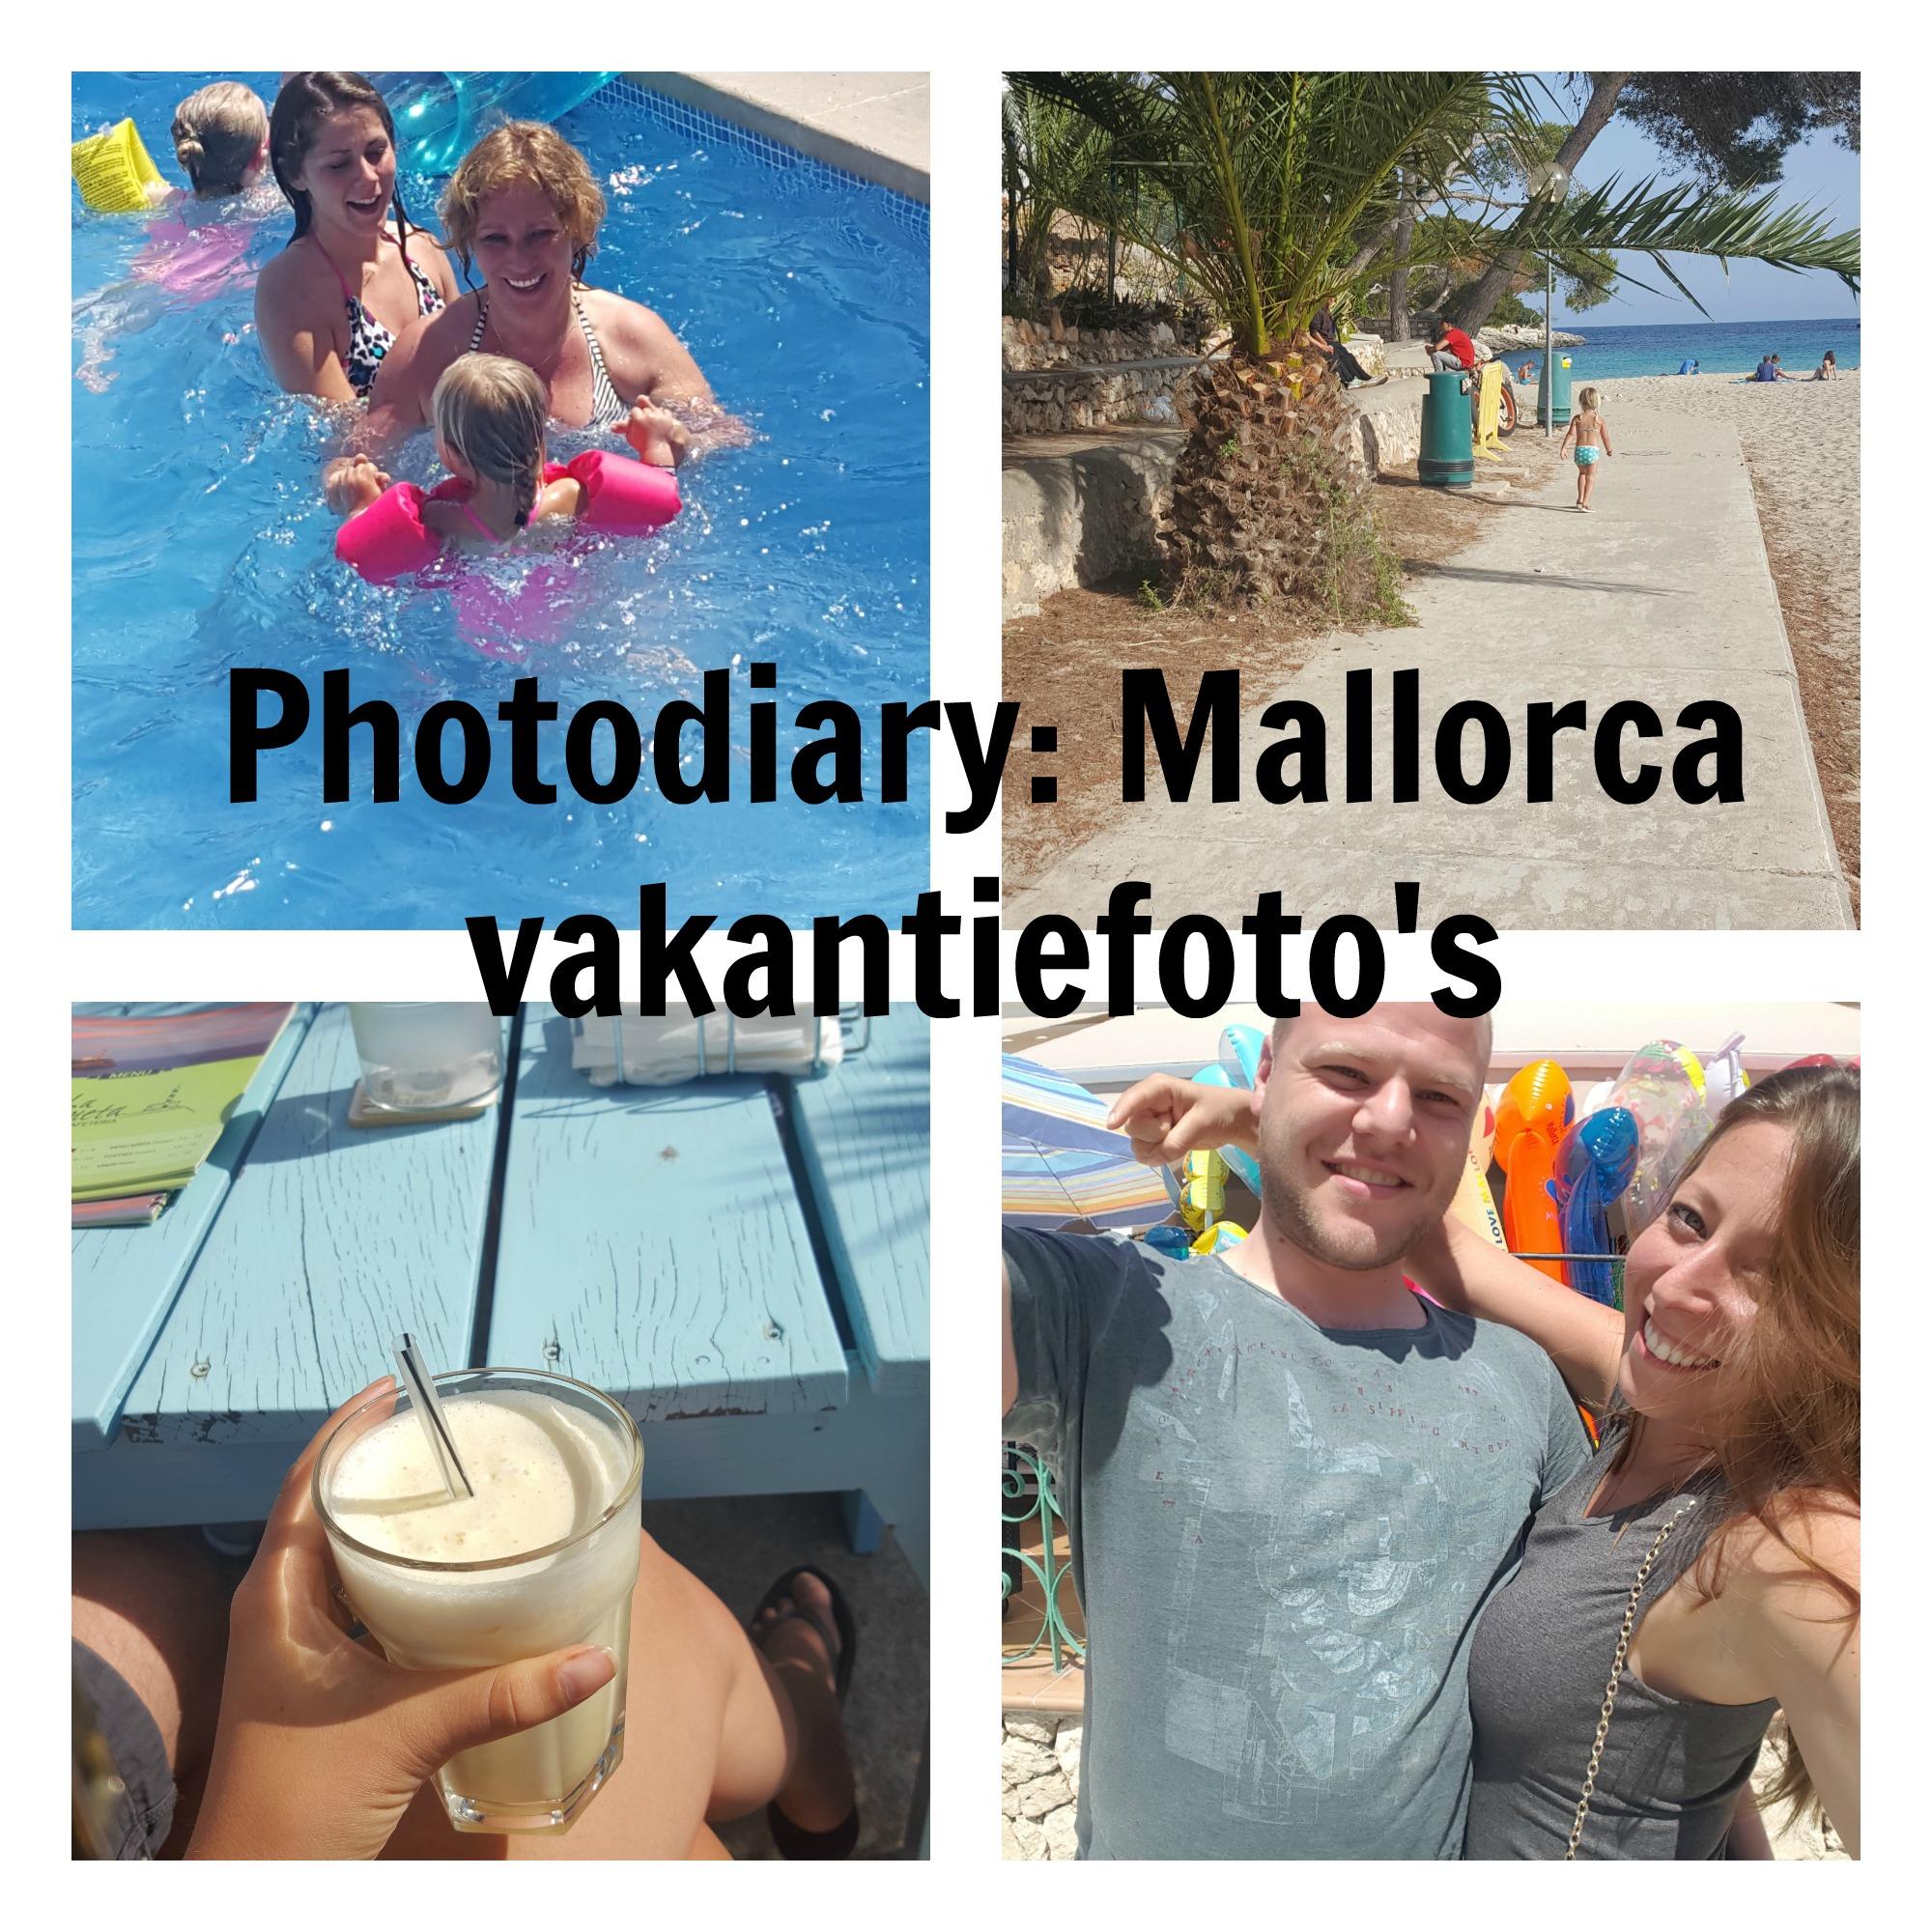 Photodiary #13 Mallorca vakantiefoto's